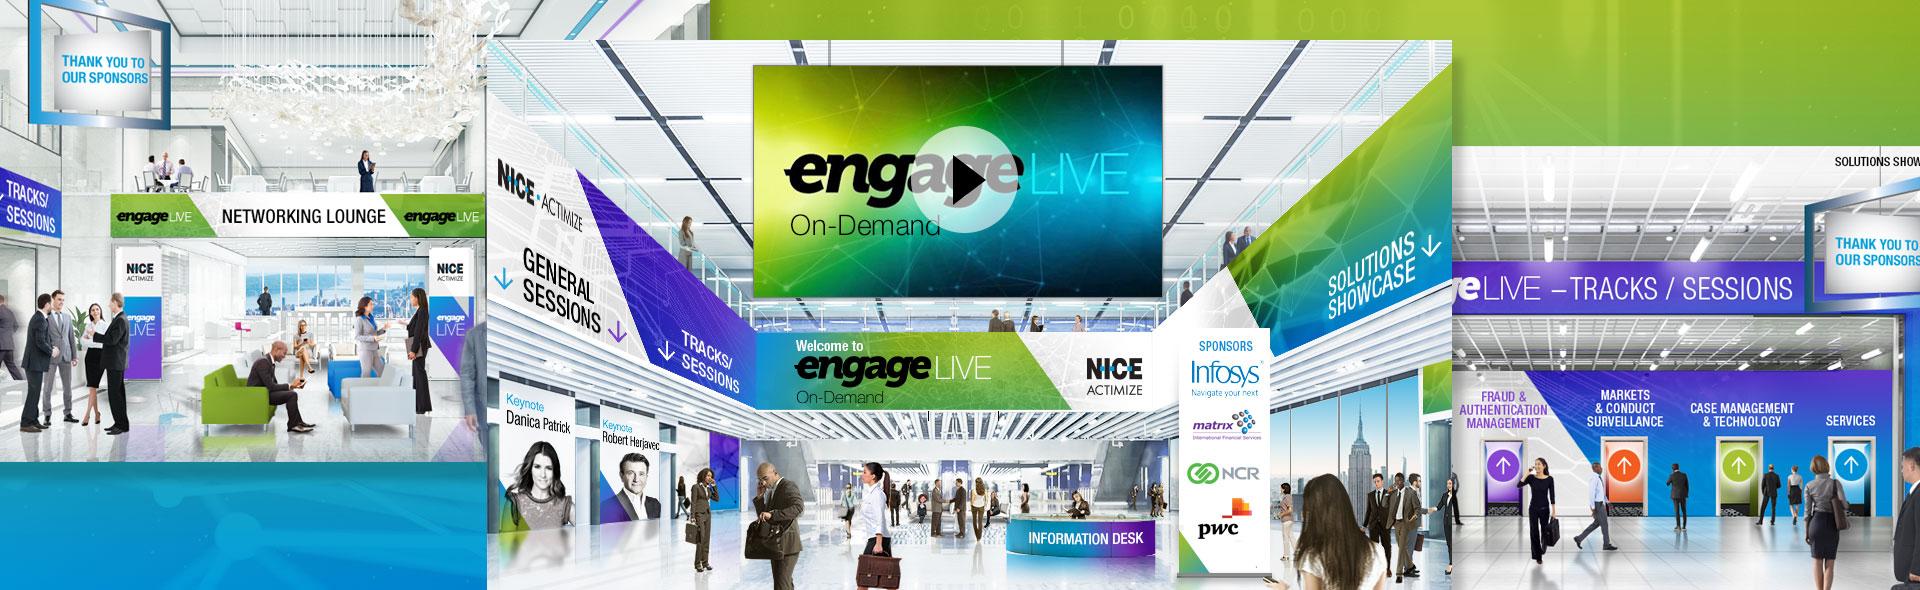 Virtual Event Design and branding